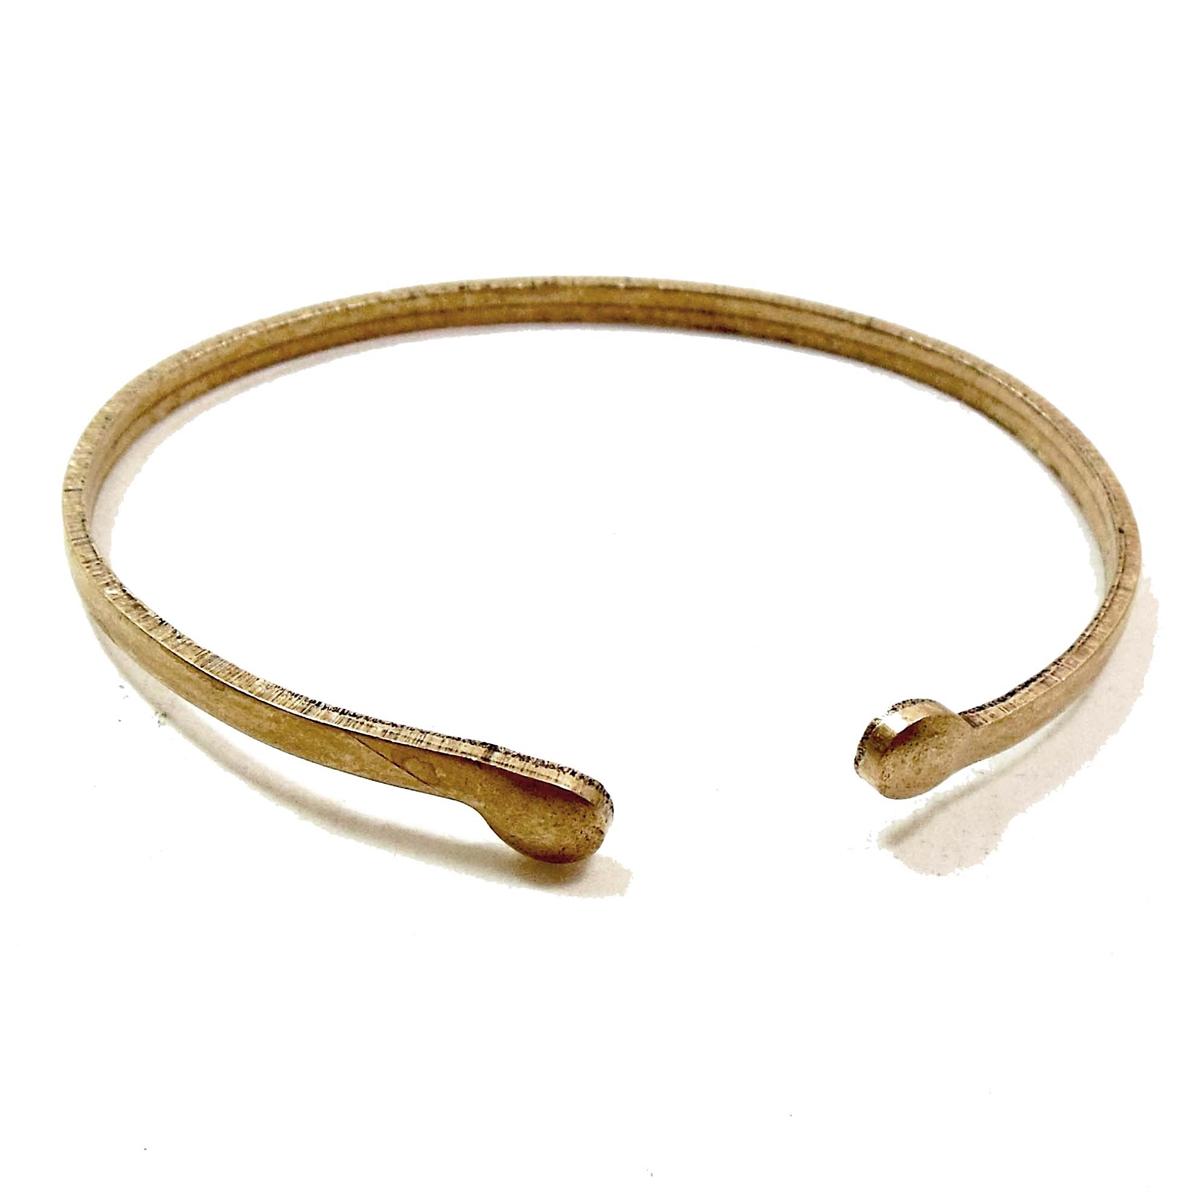 wire cuff, cuff bracelet, charms, chocolate, 07448, brass ox,brown ...